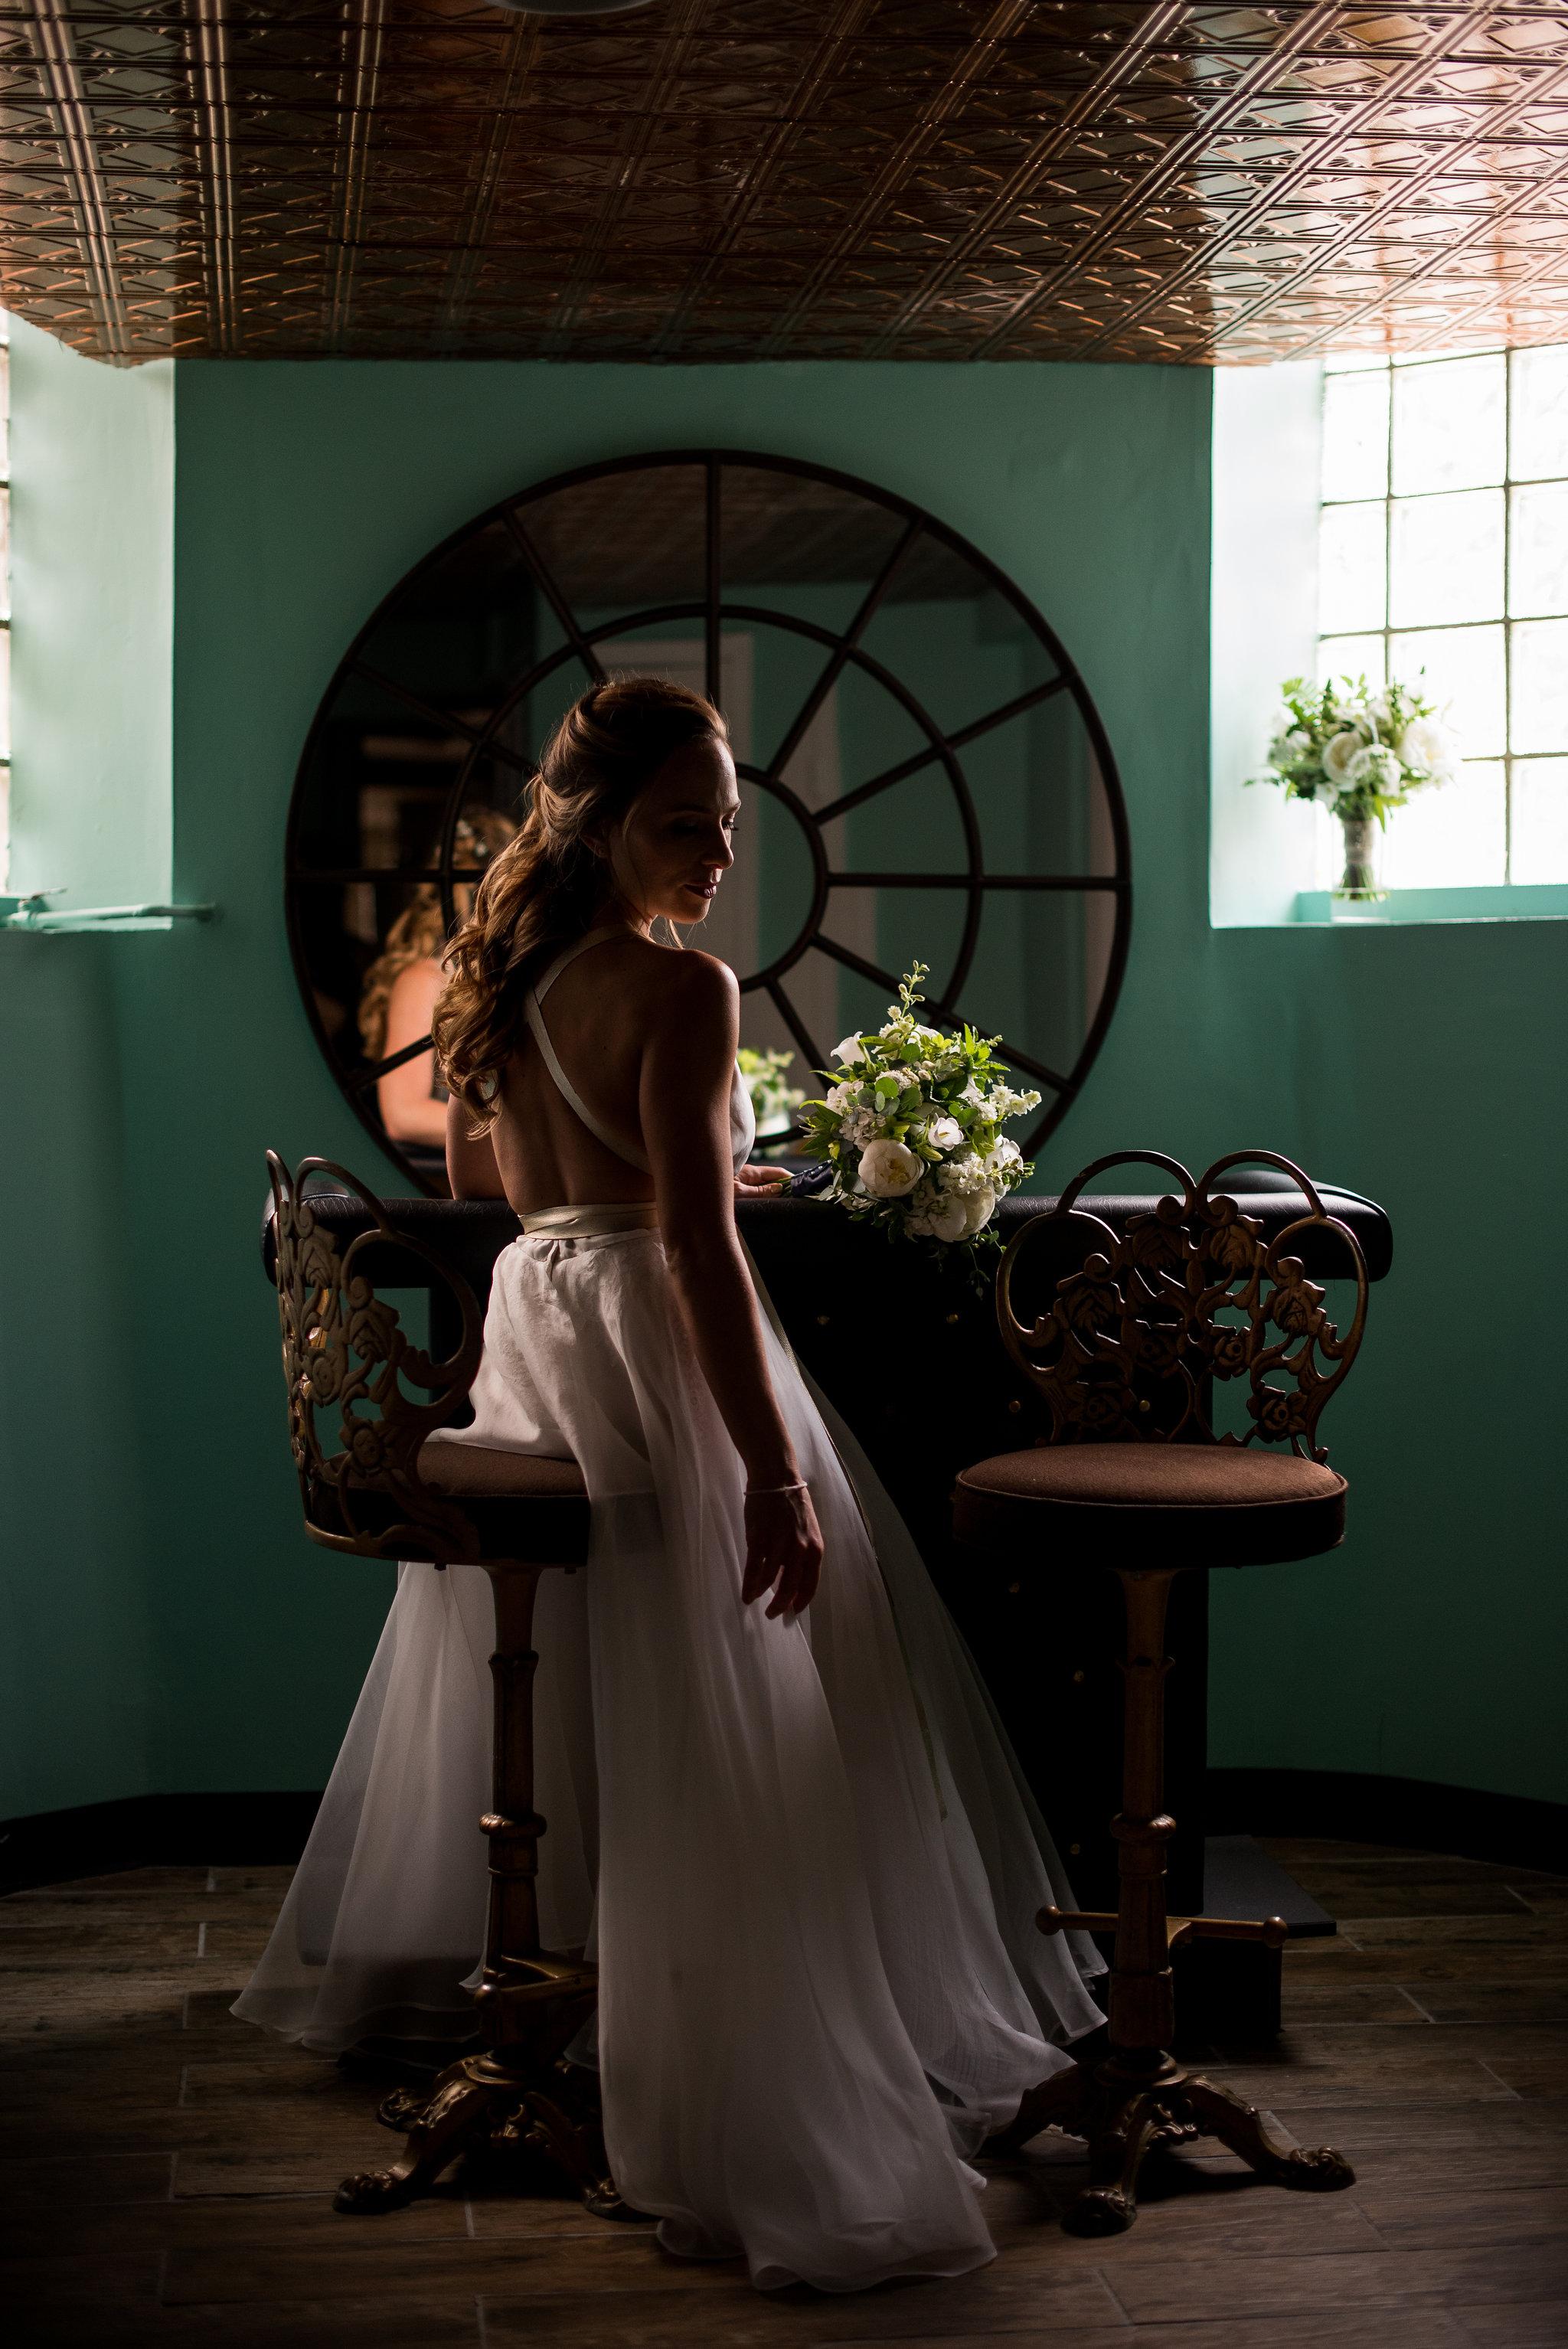 baltimore-wedding-photographer-sarah-annay-photography.jpg2.jpg